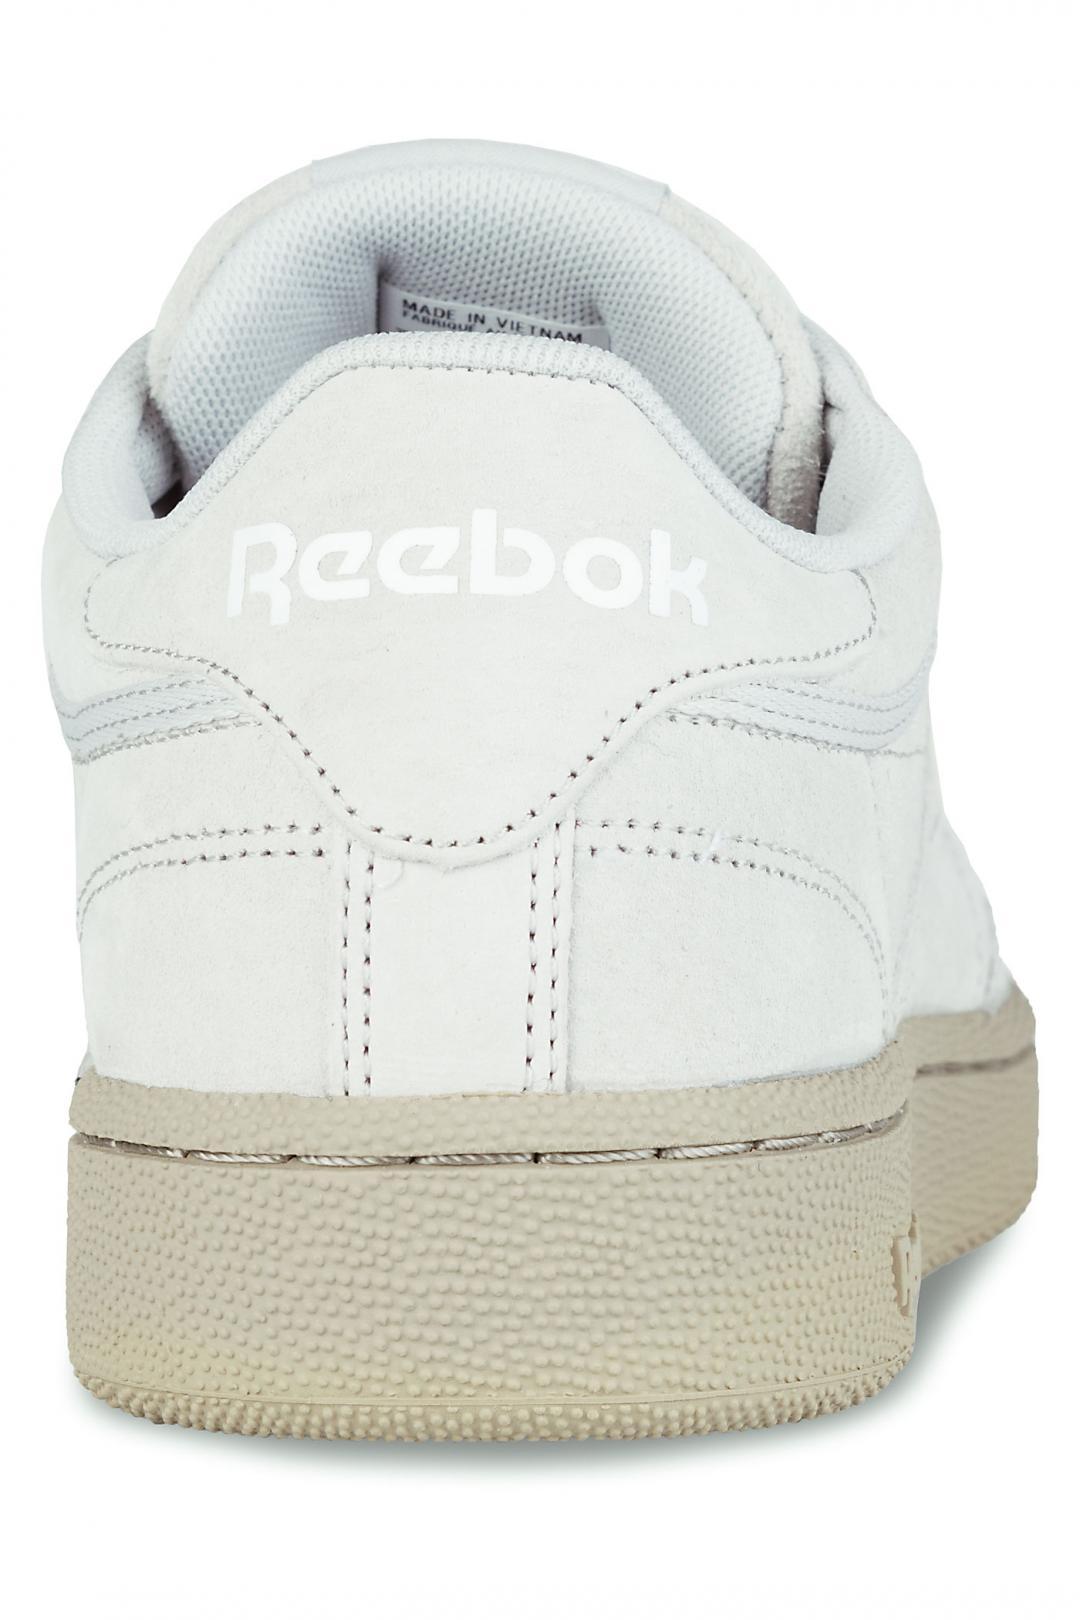 Uomo Reebok Club C 85 MU skull grey super neutral | Sneaker